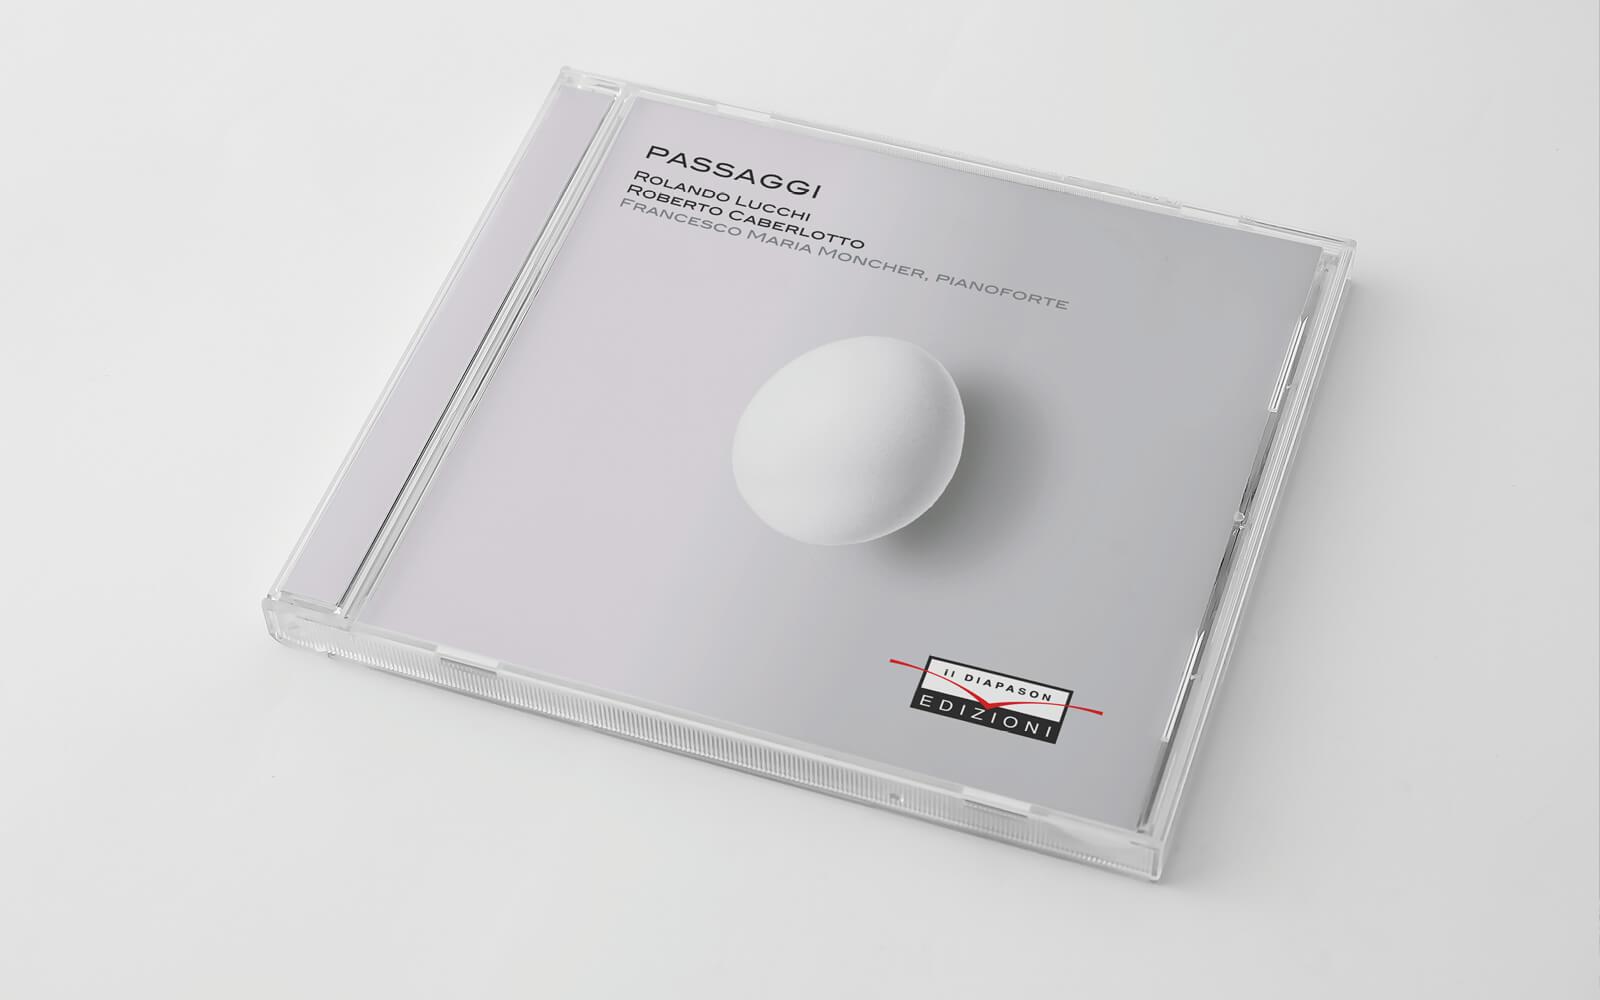 copertina-juwelbox-cd-passaggi-rolando-lucchi-robert-caberlotto-progetto-diadestudio-arco-trento